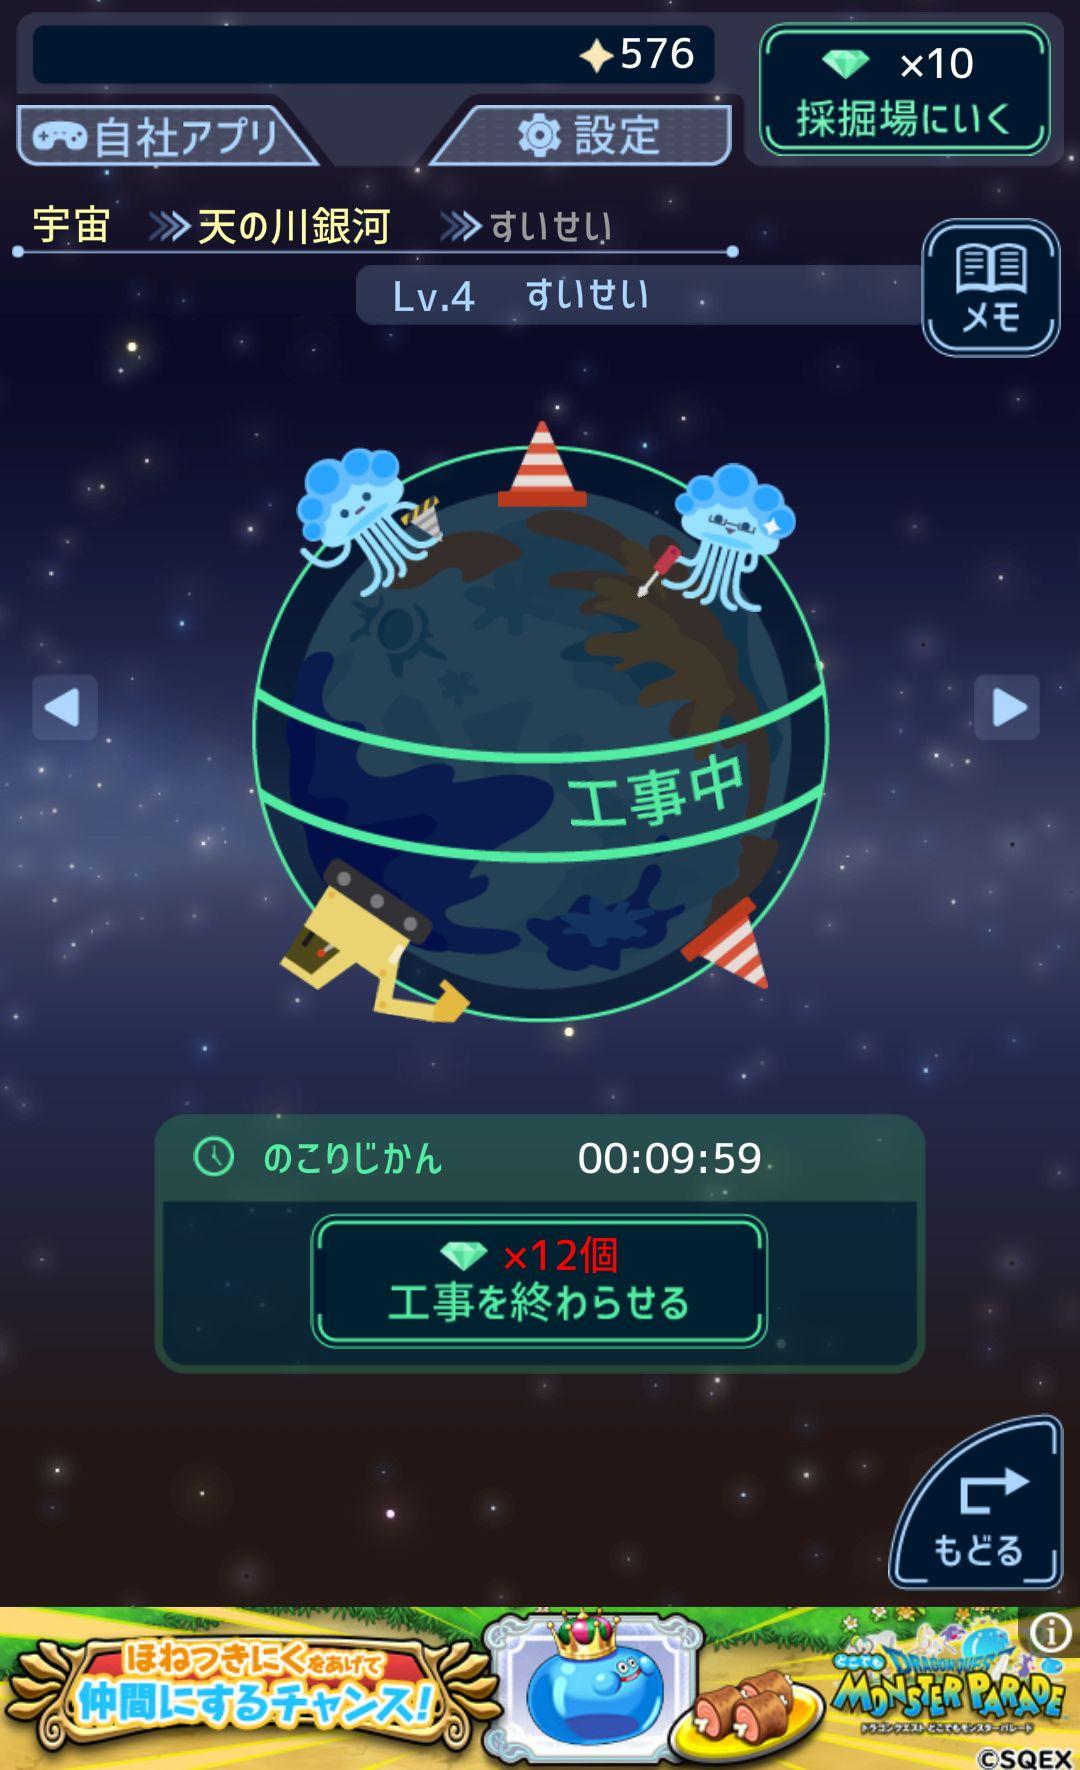 androidアプリ コスモロジー攻略スクリーンショット2